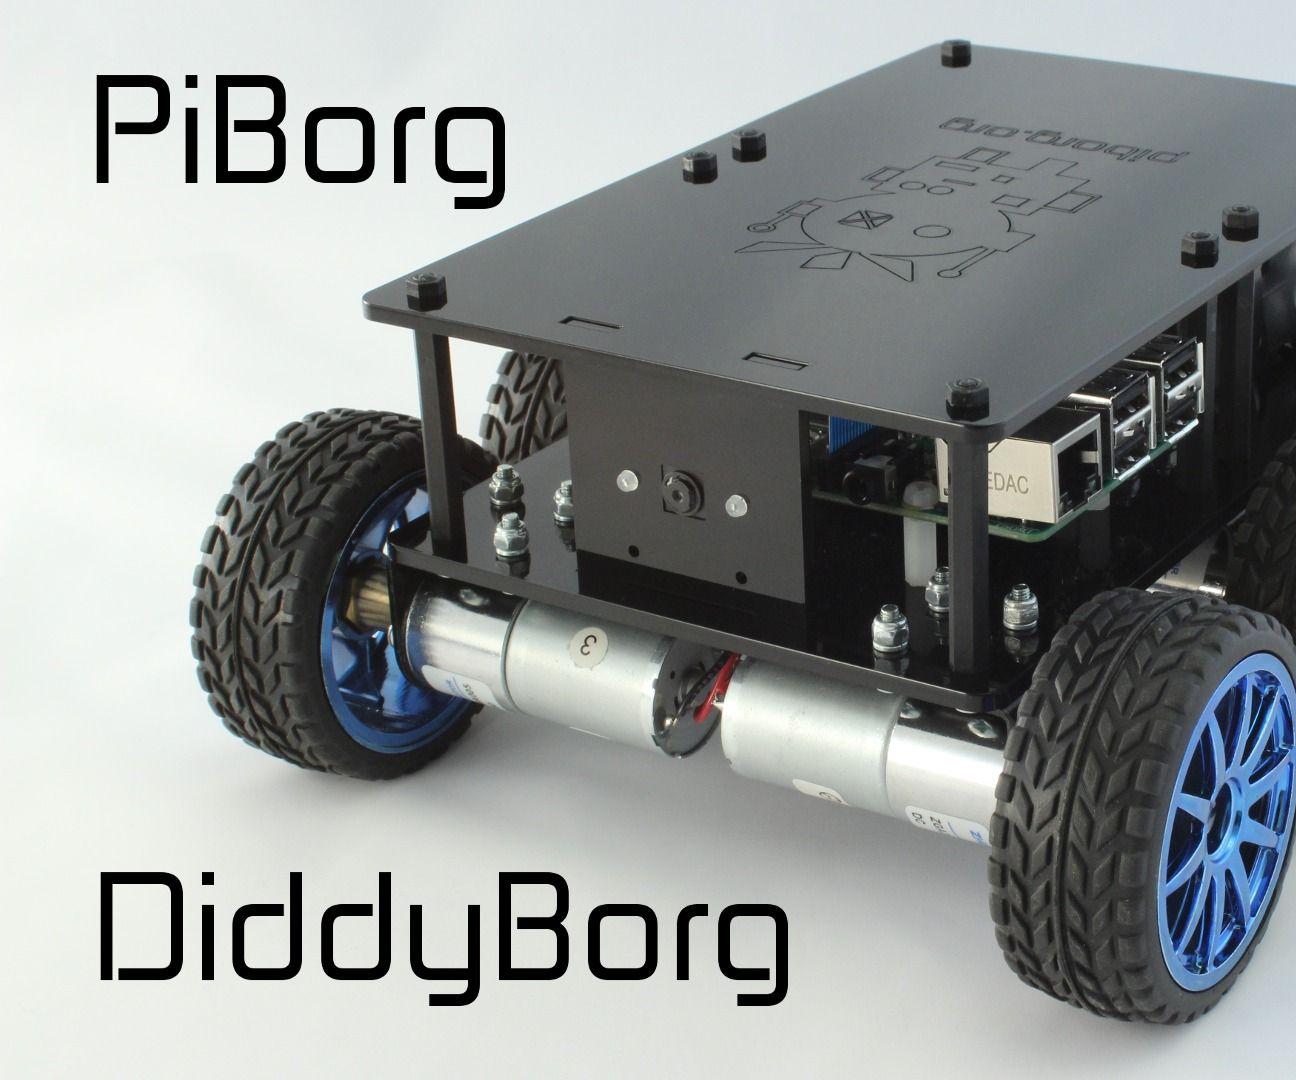 DiddyBorg: the Mini 6 Wheeled Raspberry Pi Robot!   Robotics